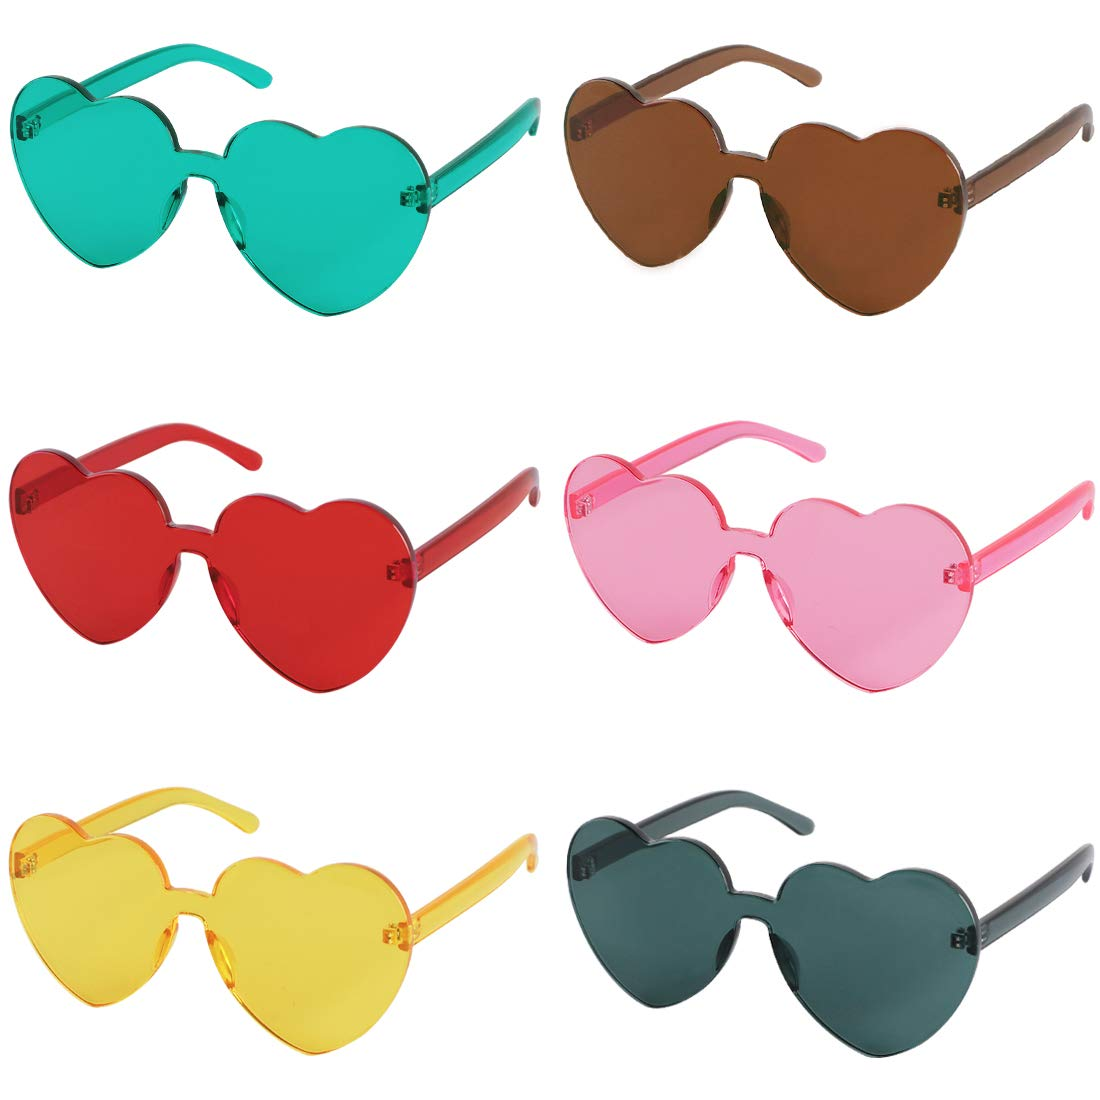 f9b505a26d kilofly 6 Sets Heart Shaped Yellow Red Orange Rainbow Colored Women  Sunglasses  Amazon.co.uk  Clothing